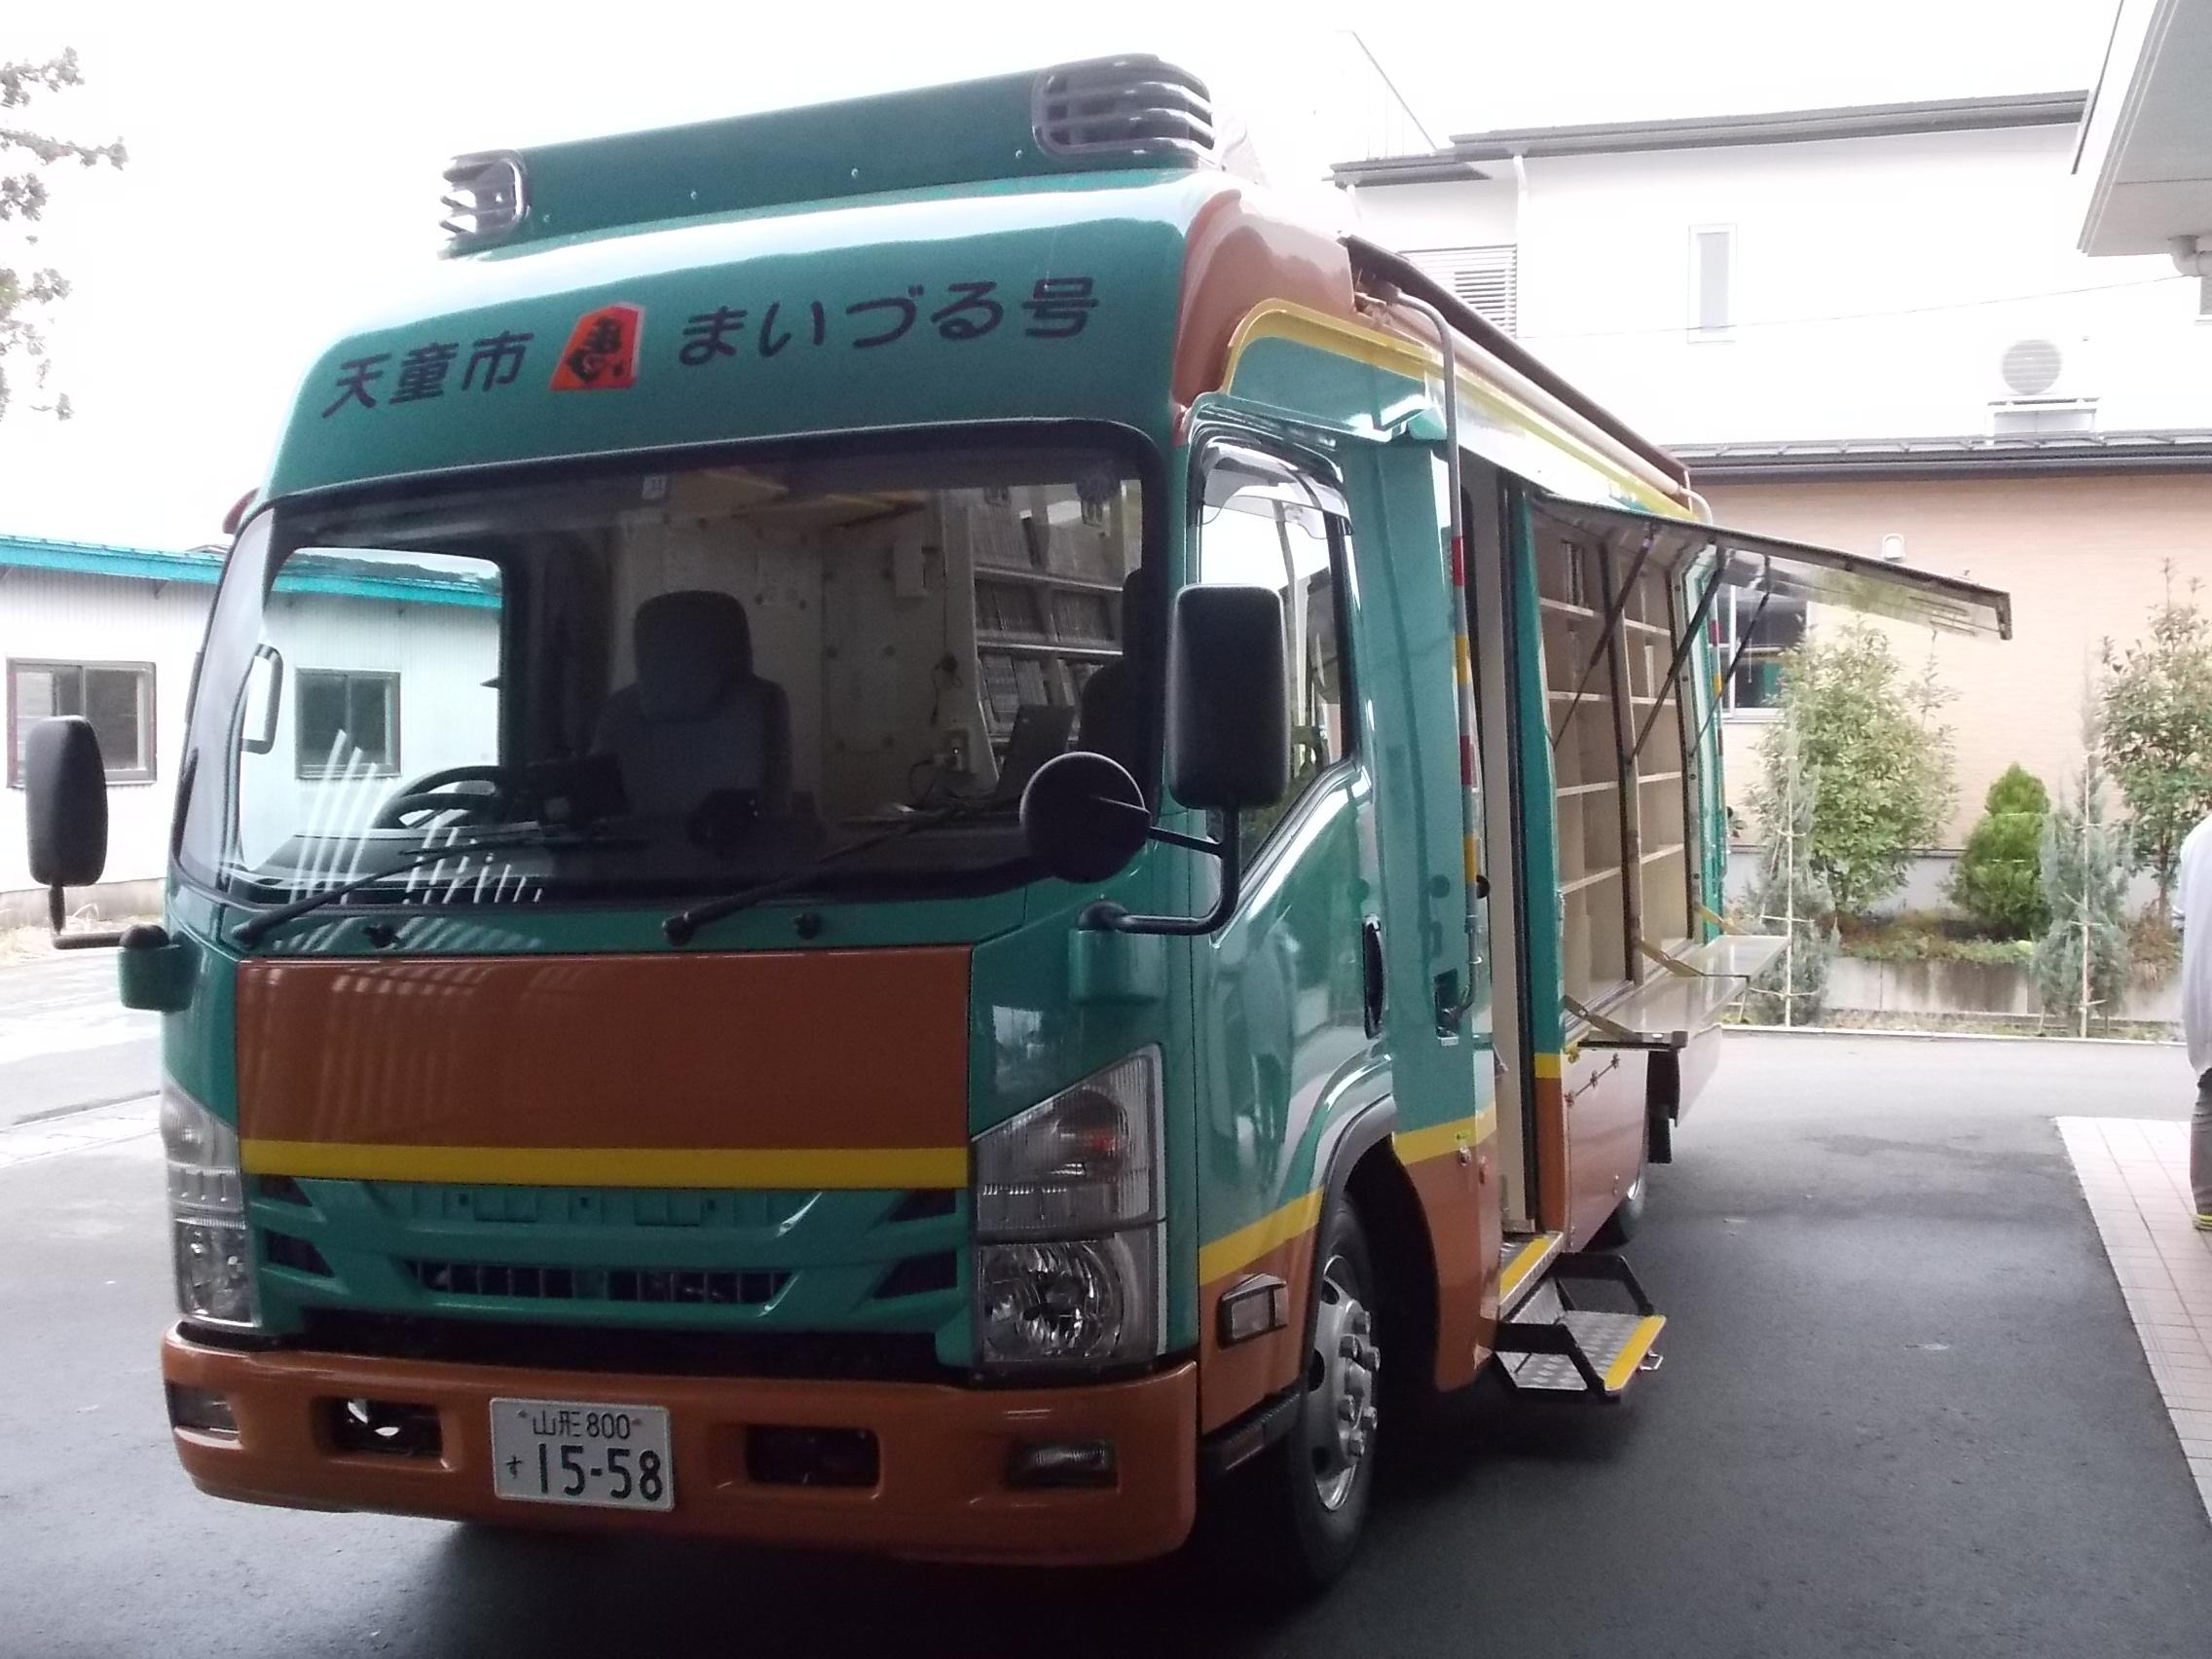 http://meikouen.or.jp/news/DSCN7983.JPG